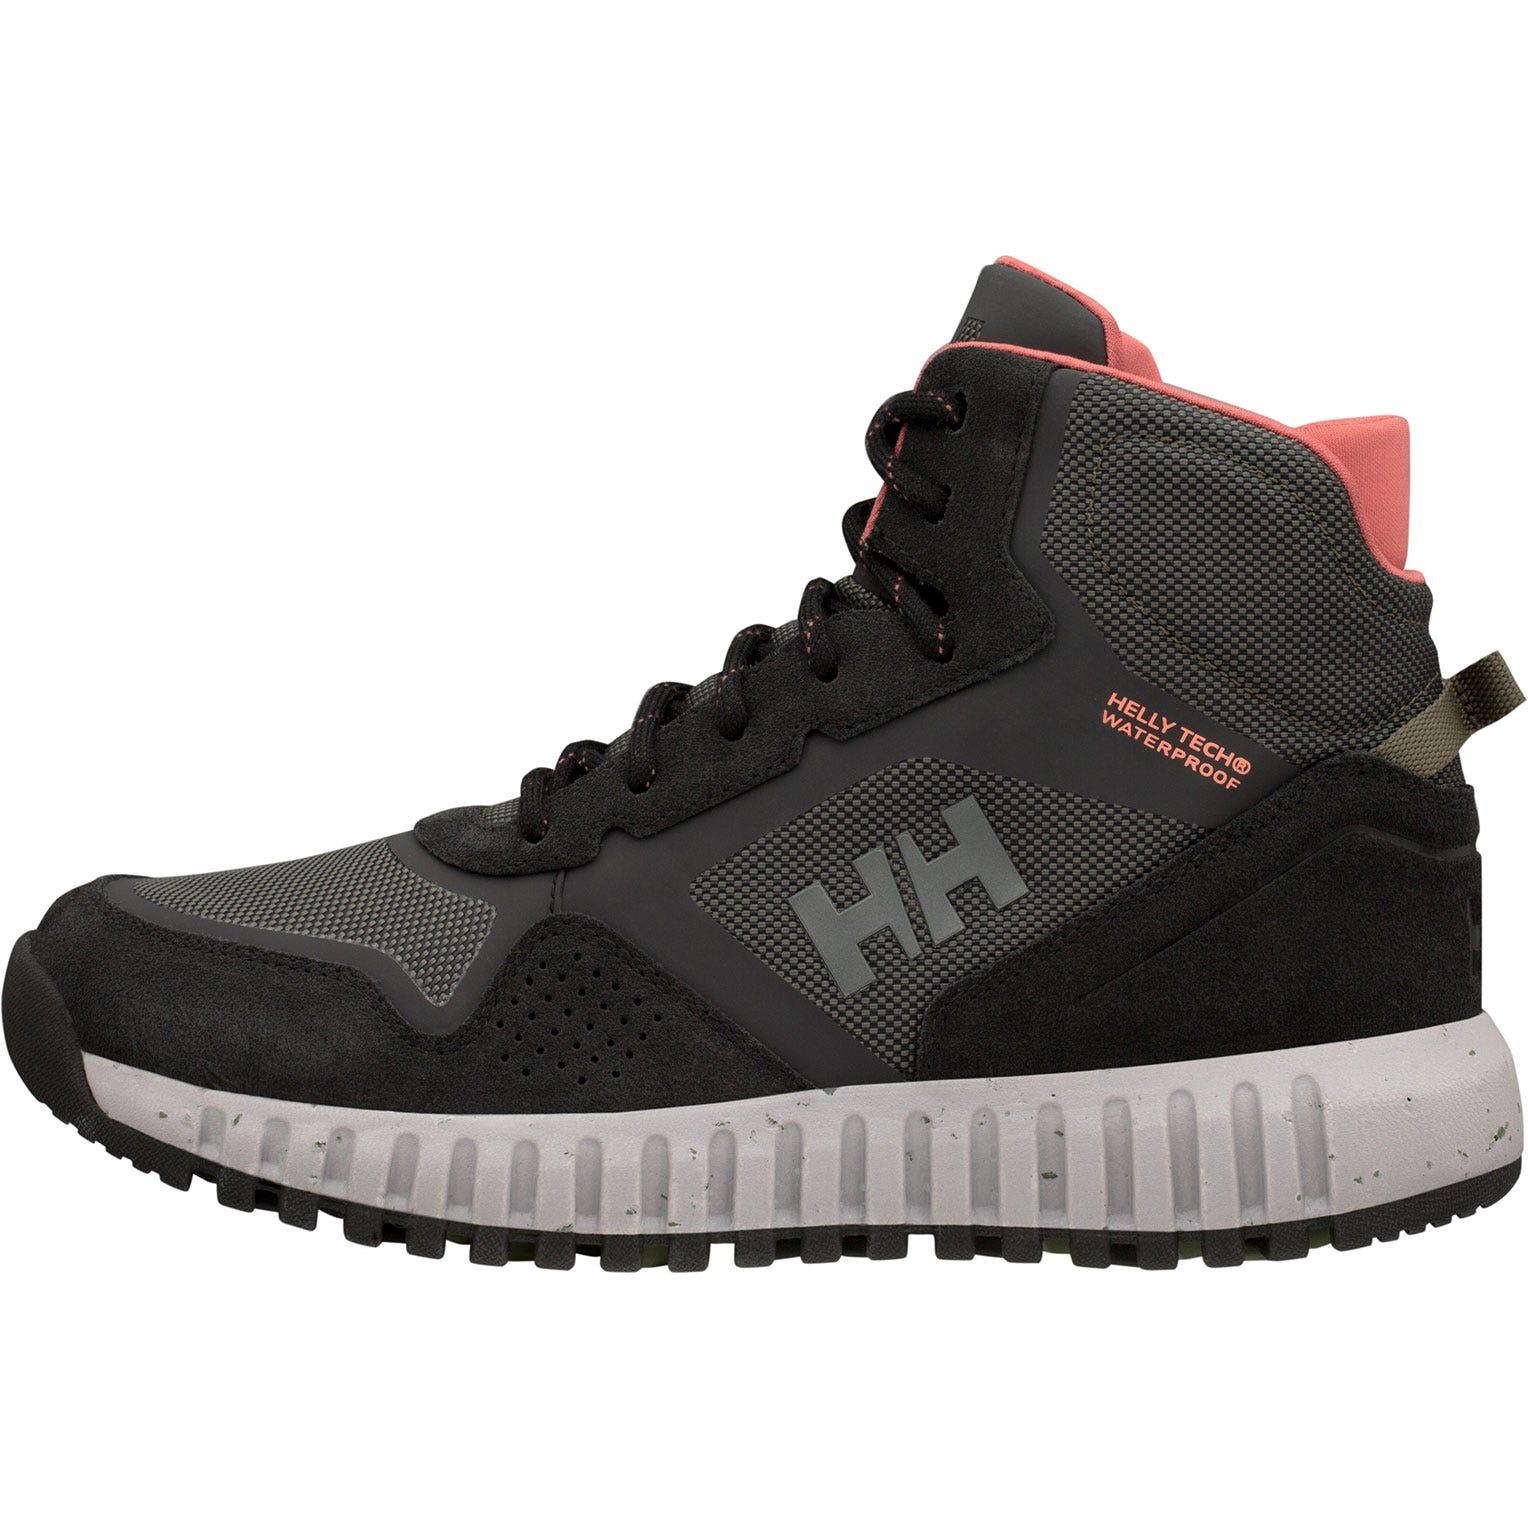 Helly Hansen W Monashee Ullr Ht Womens Hiking Boot Black 42/10